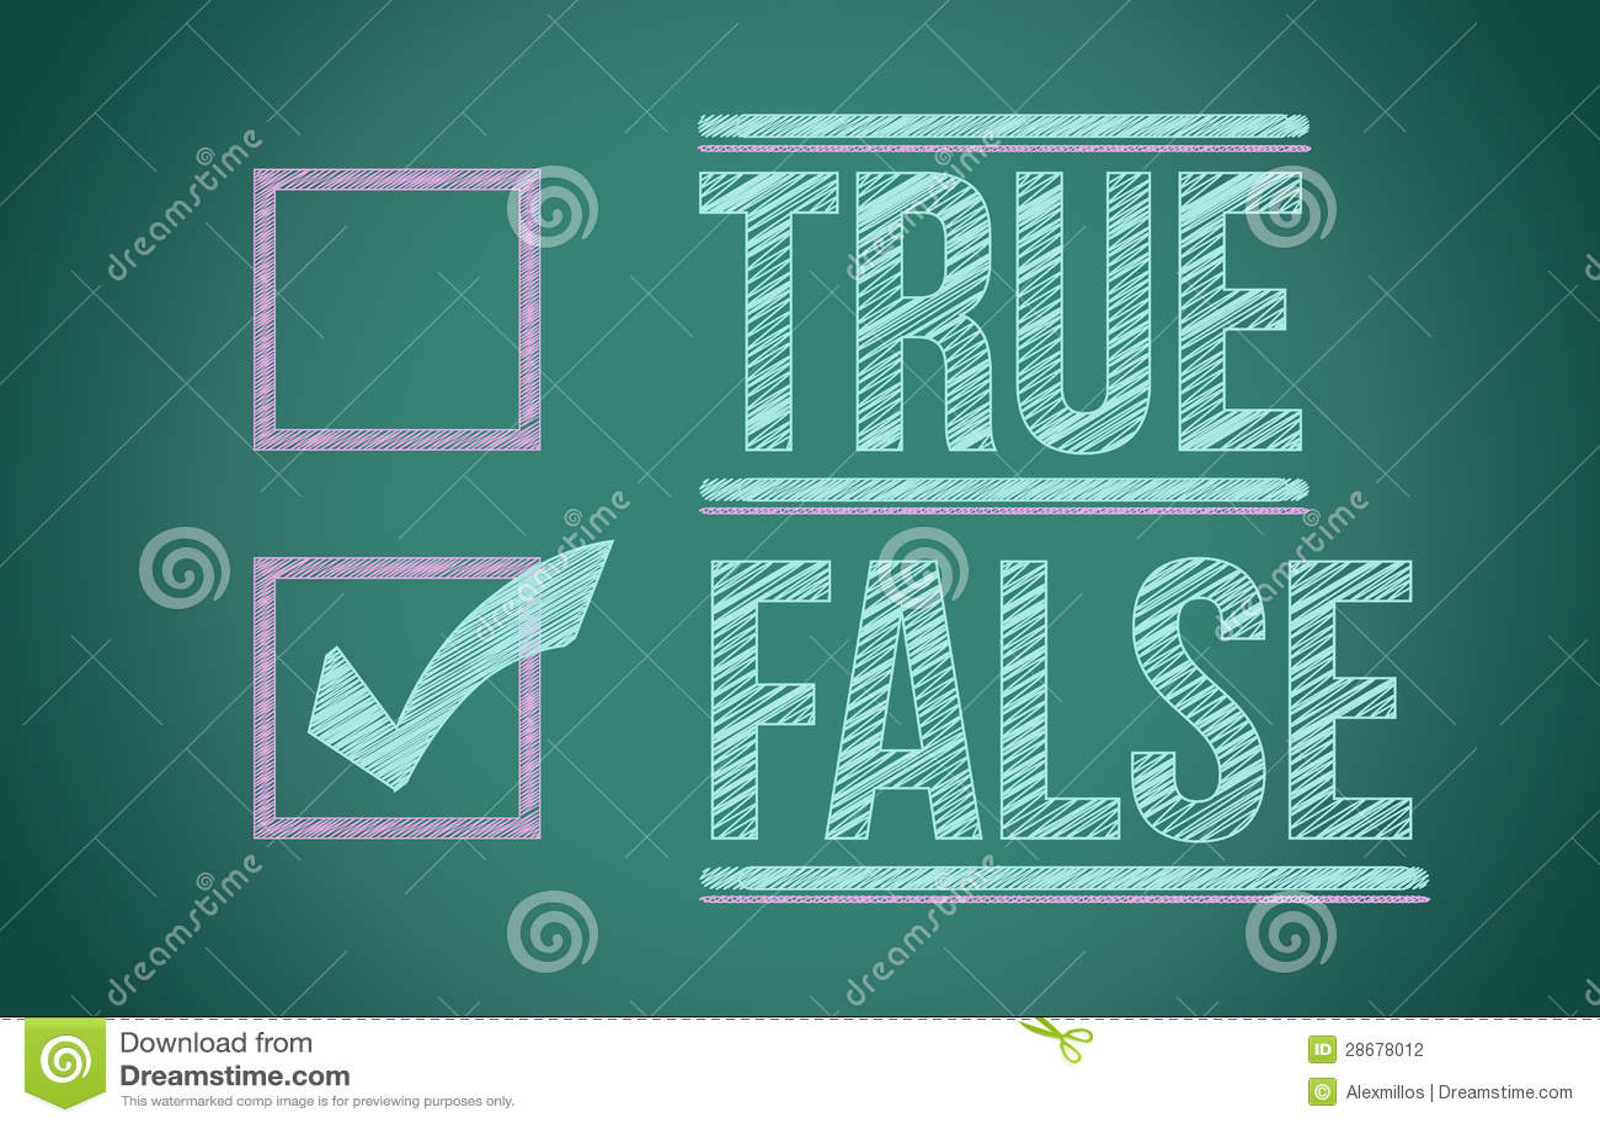 True And False Check Box Stock Photography - Image: 28678012